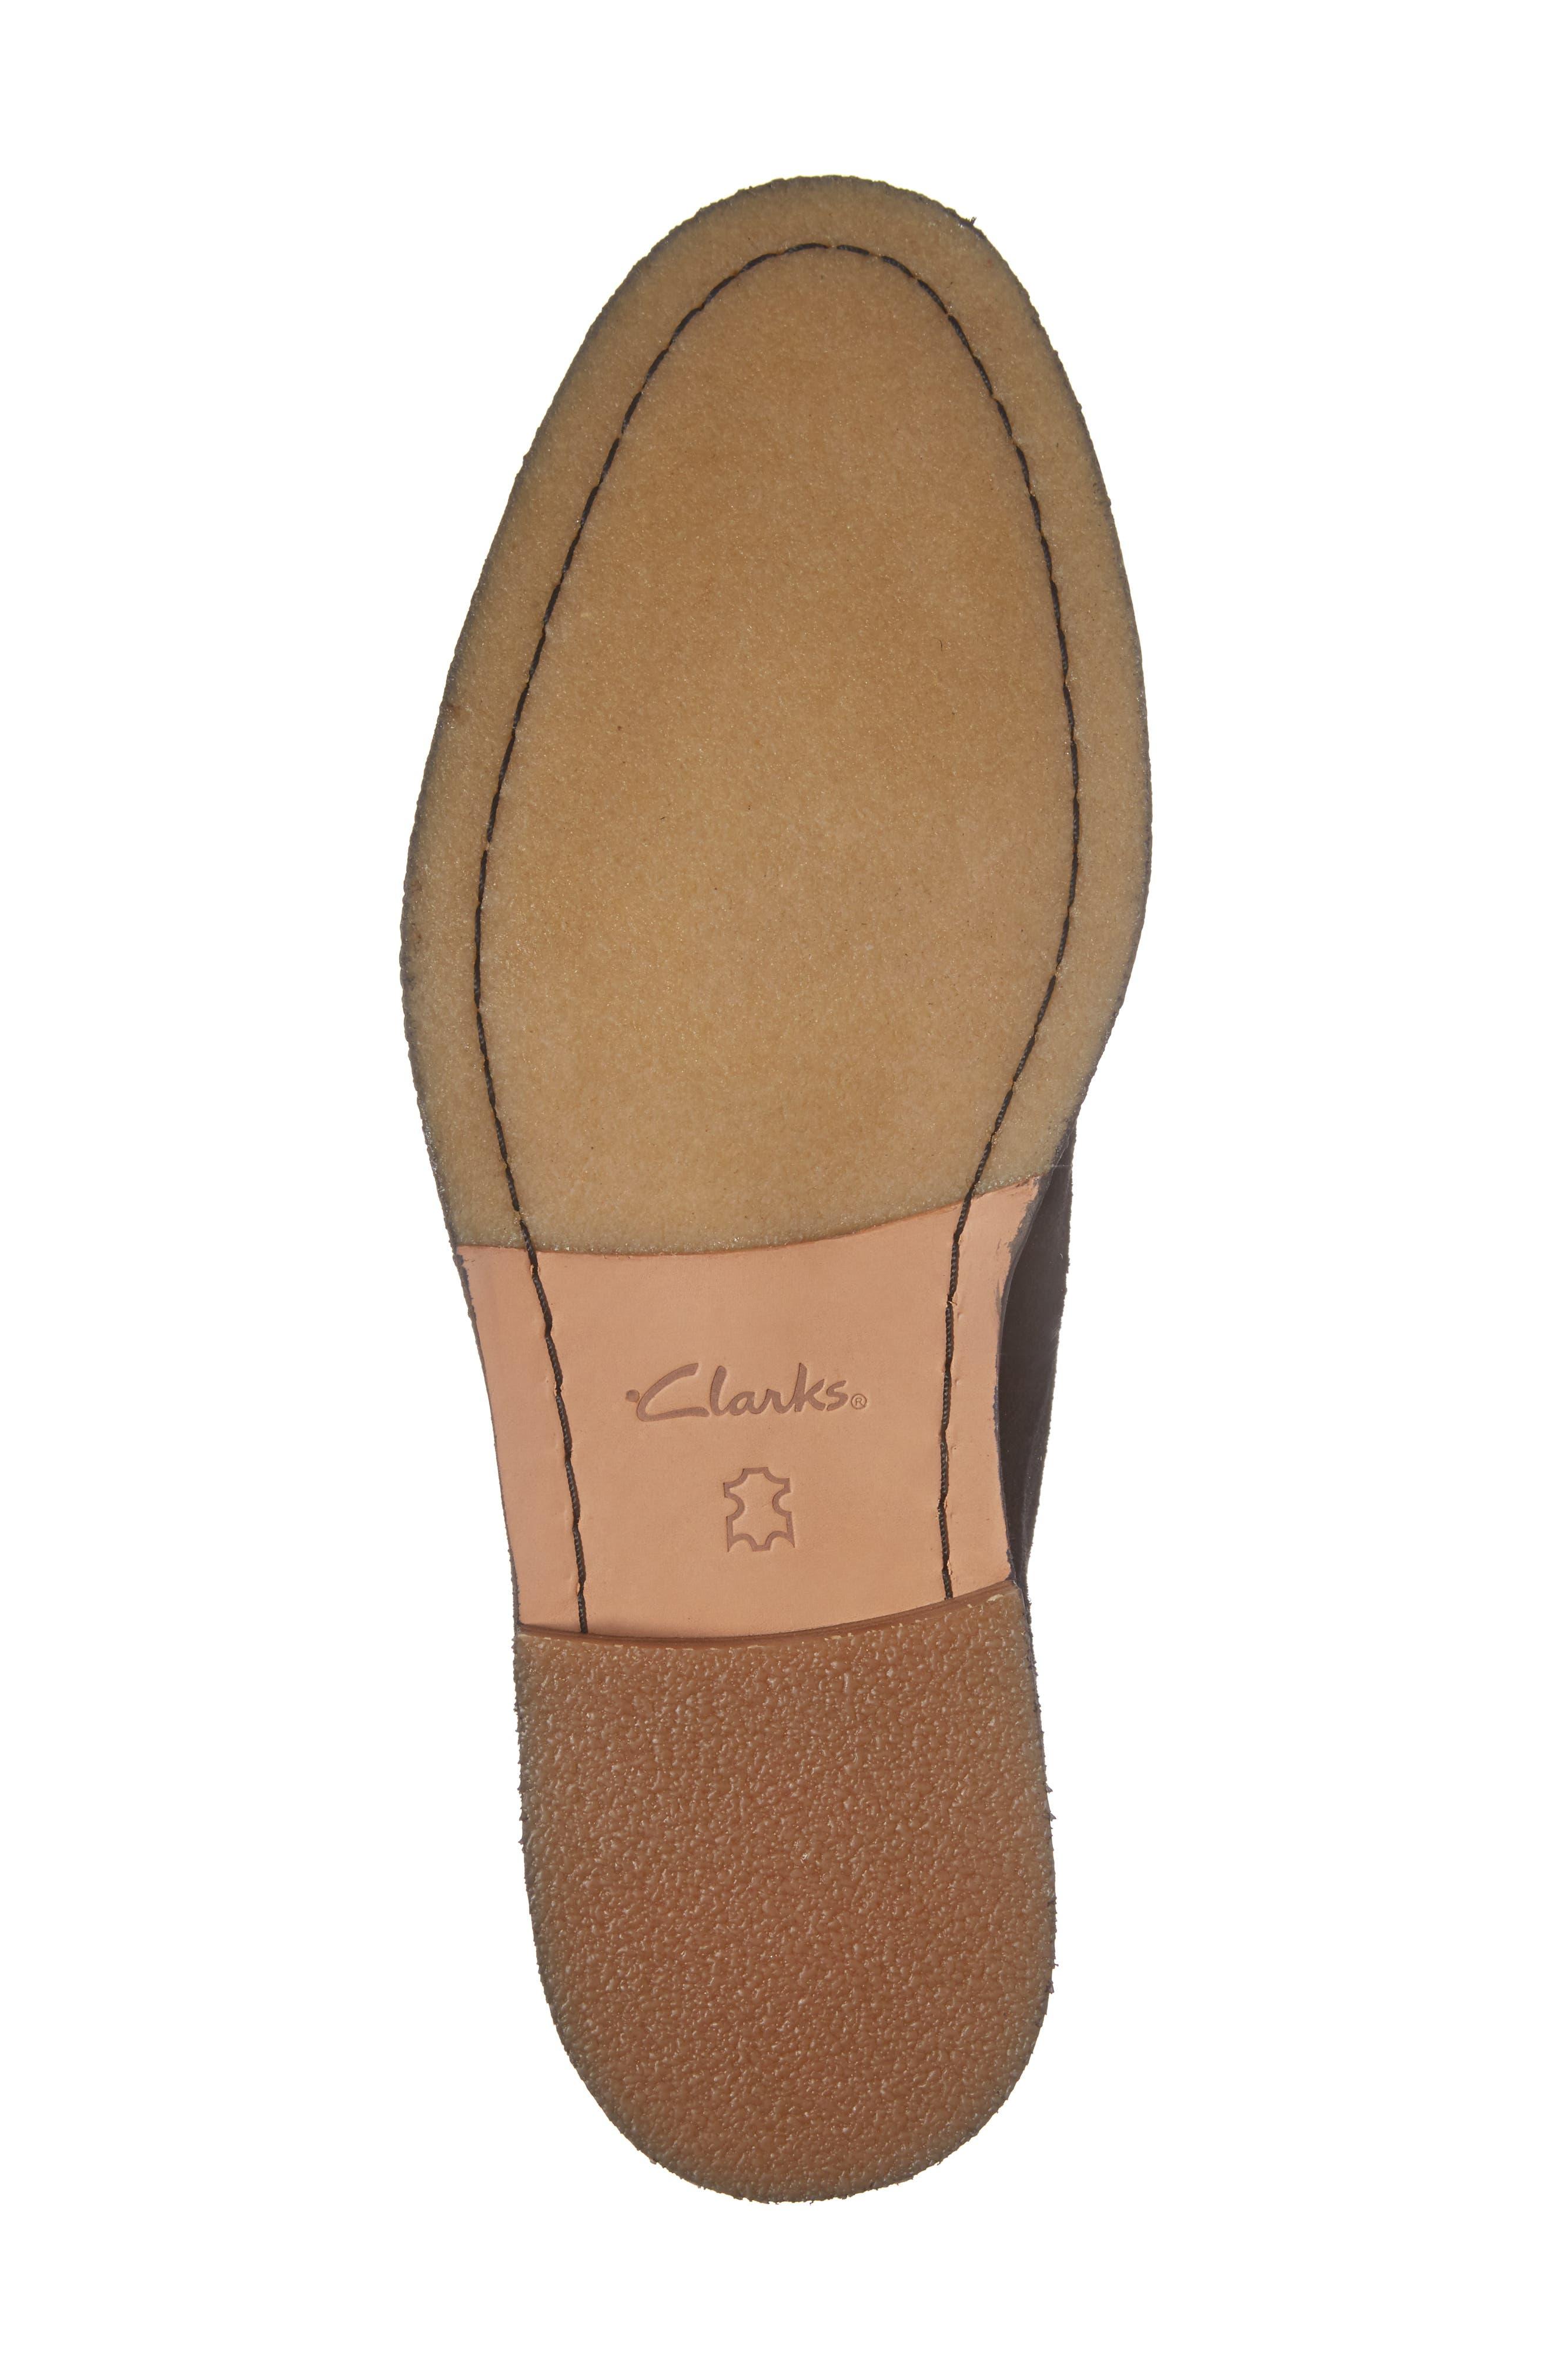 Clarks Clarkdale Moon Buck Shoe,                             Alternate thumbnail 16, color,